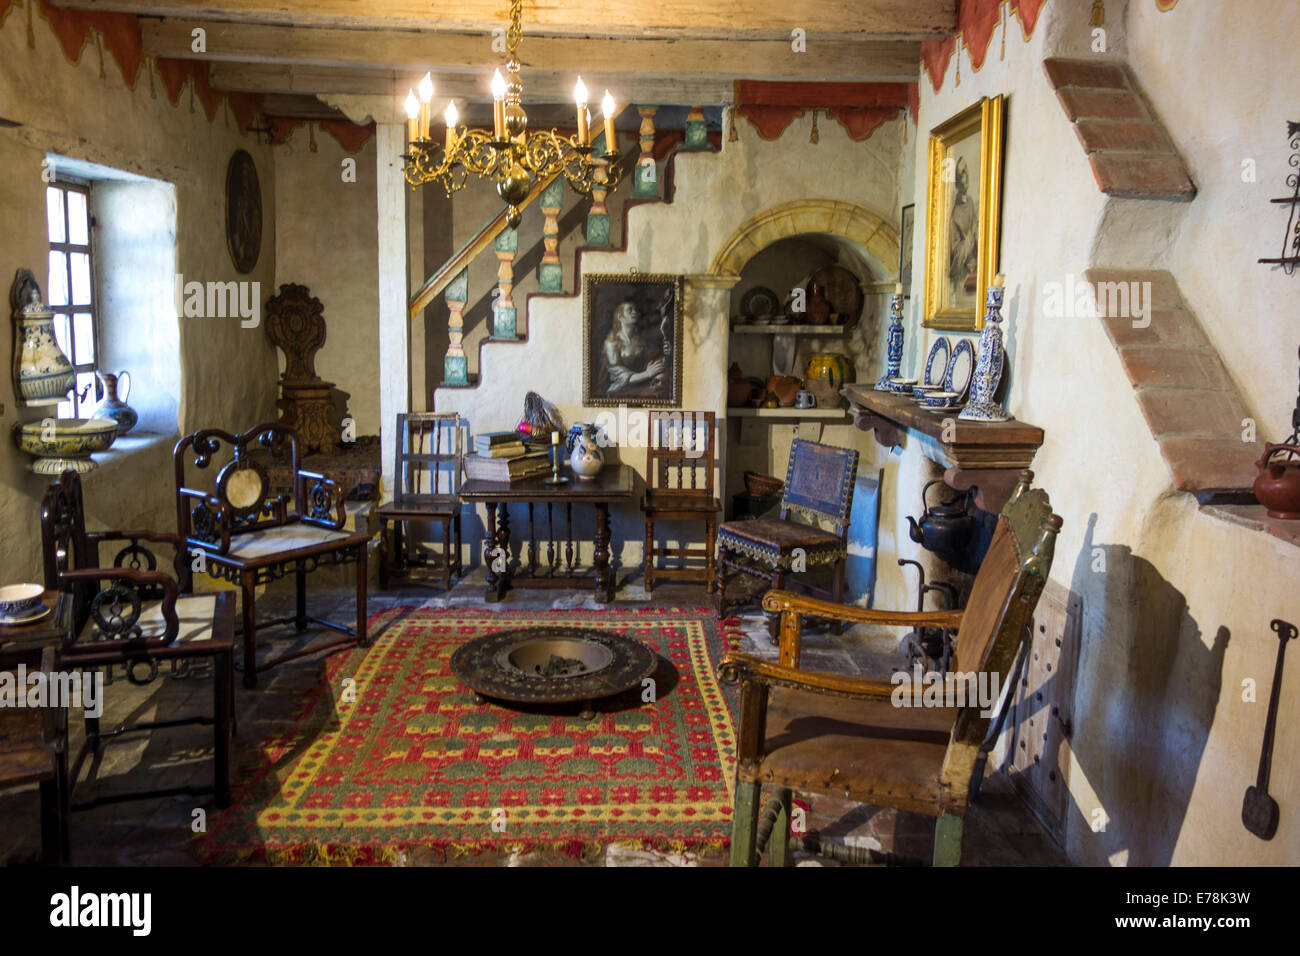 Museum In Historic Old Mission San Carlos Borromeo De Carmelo Founded 1770  In Carmel Valley; Carmel; California; United States